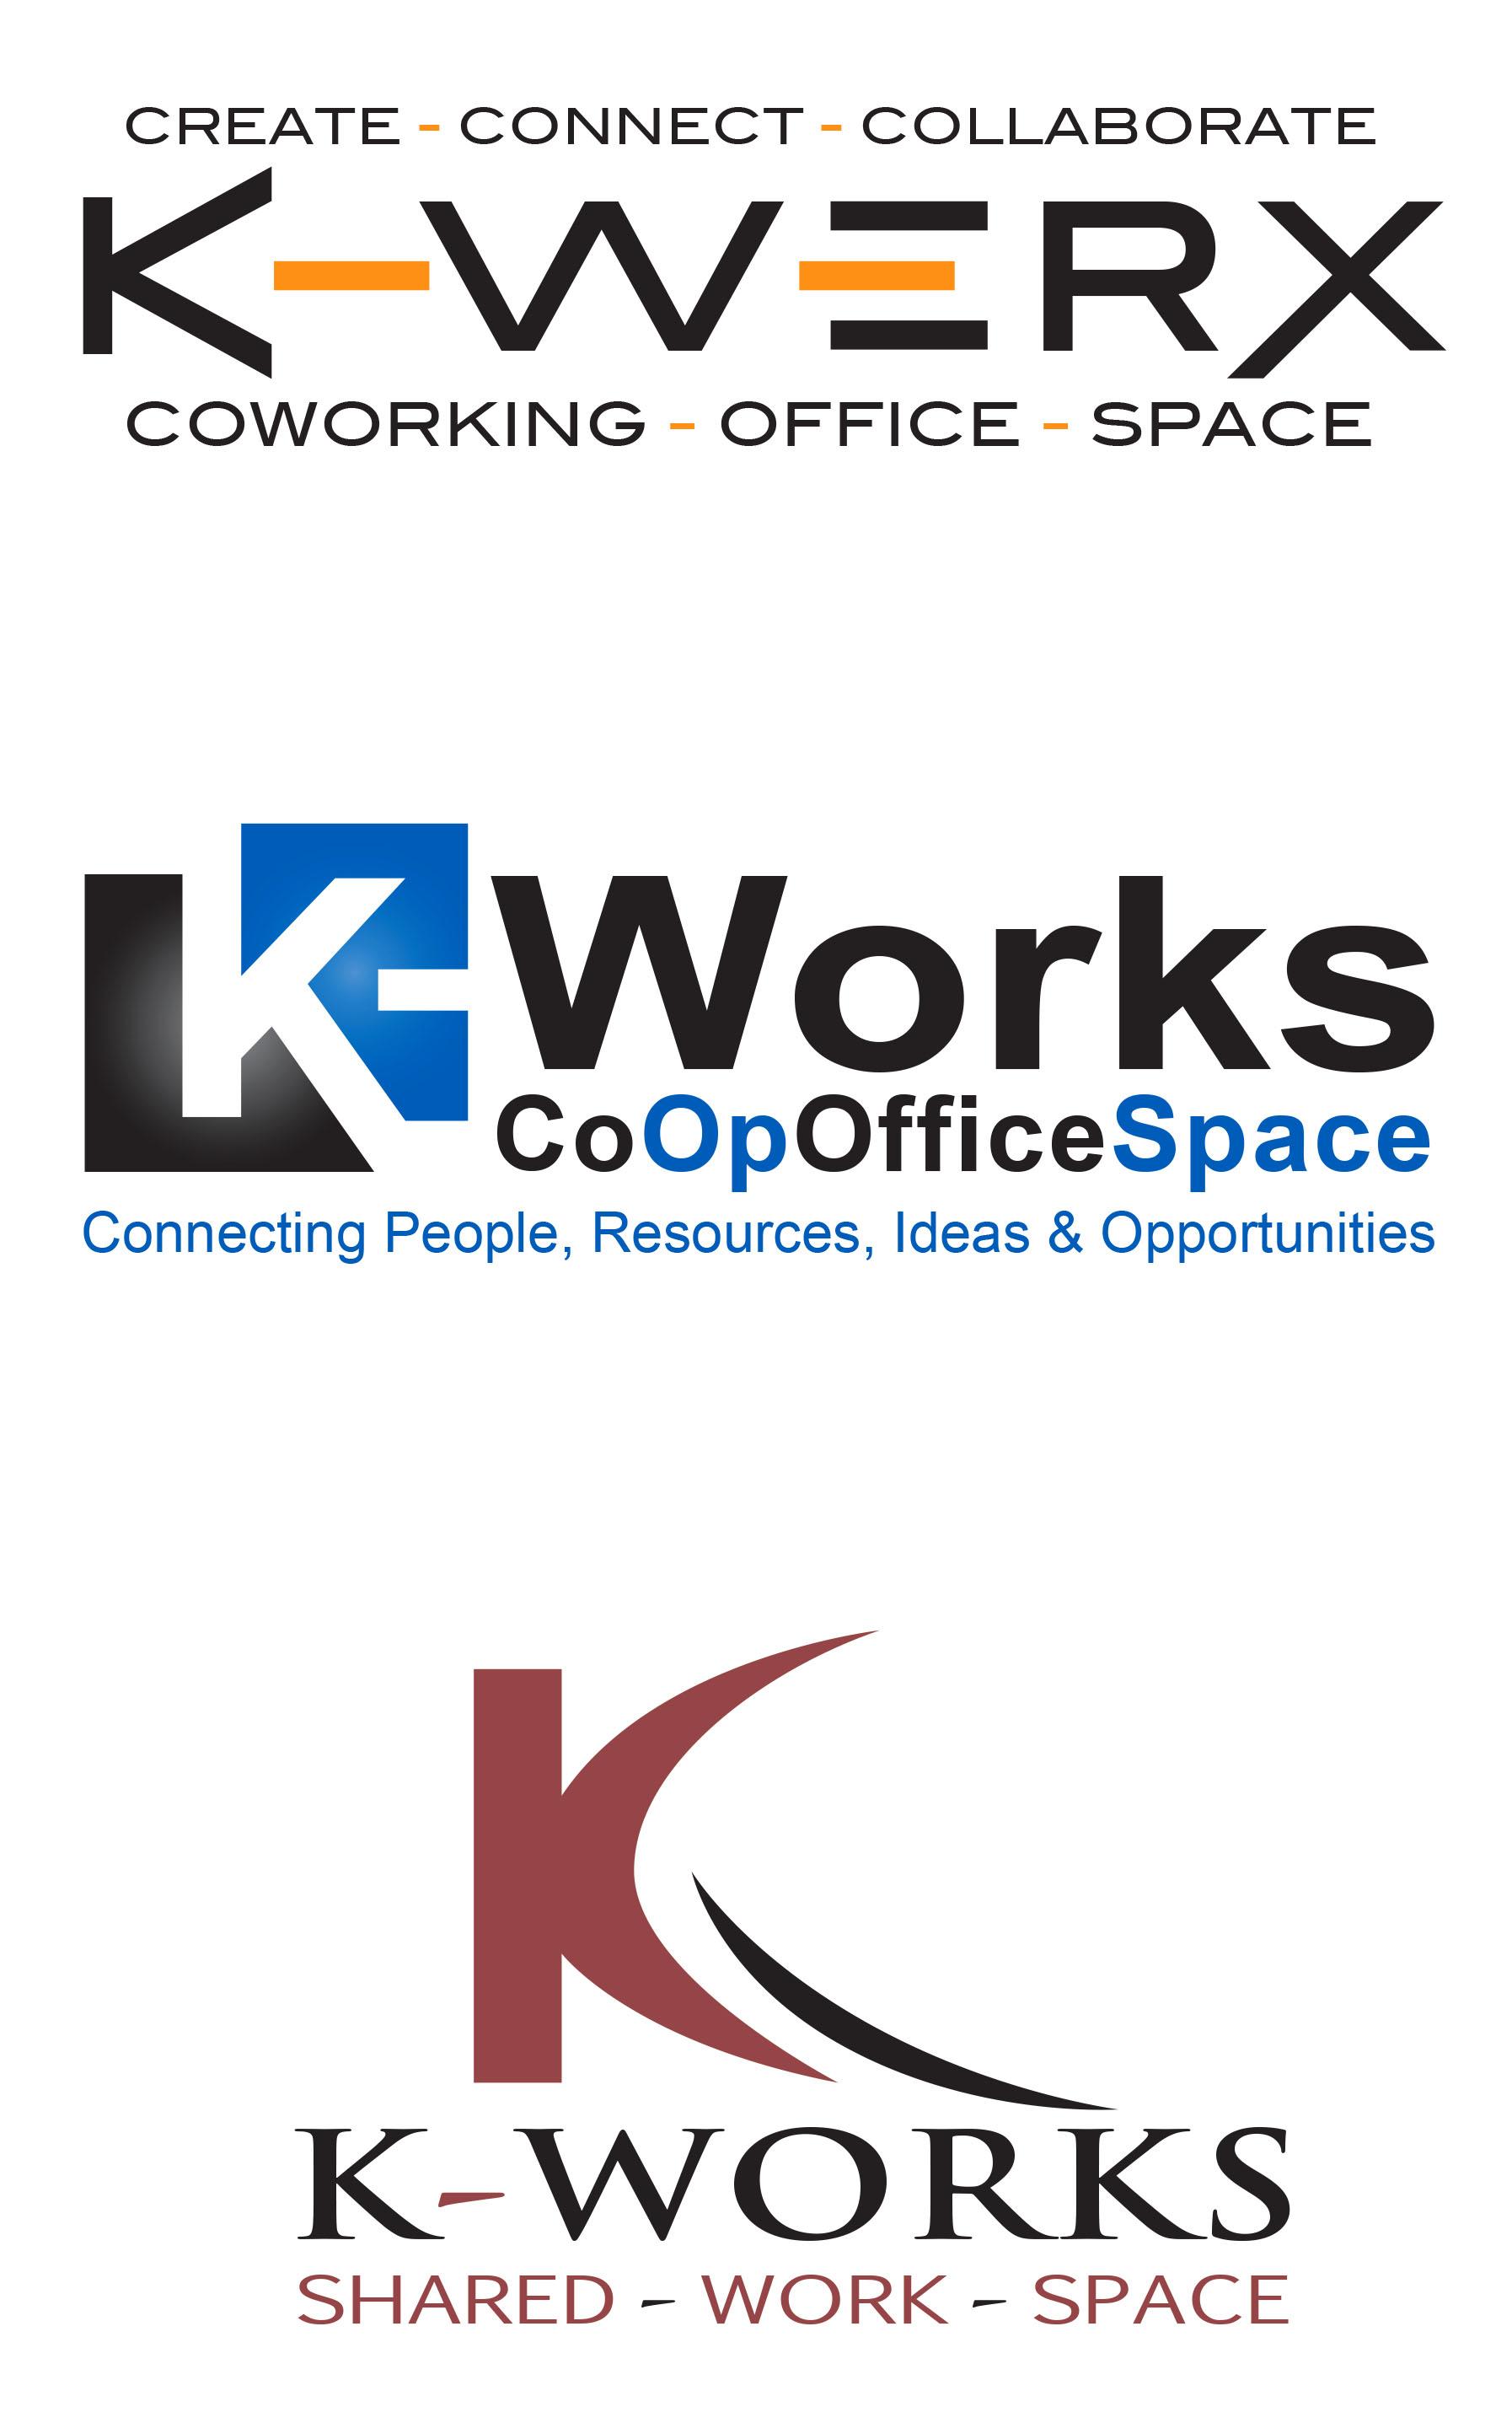 K-WorksLogoConcepts